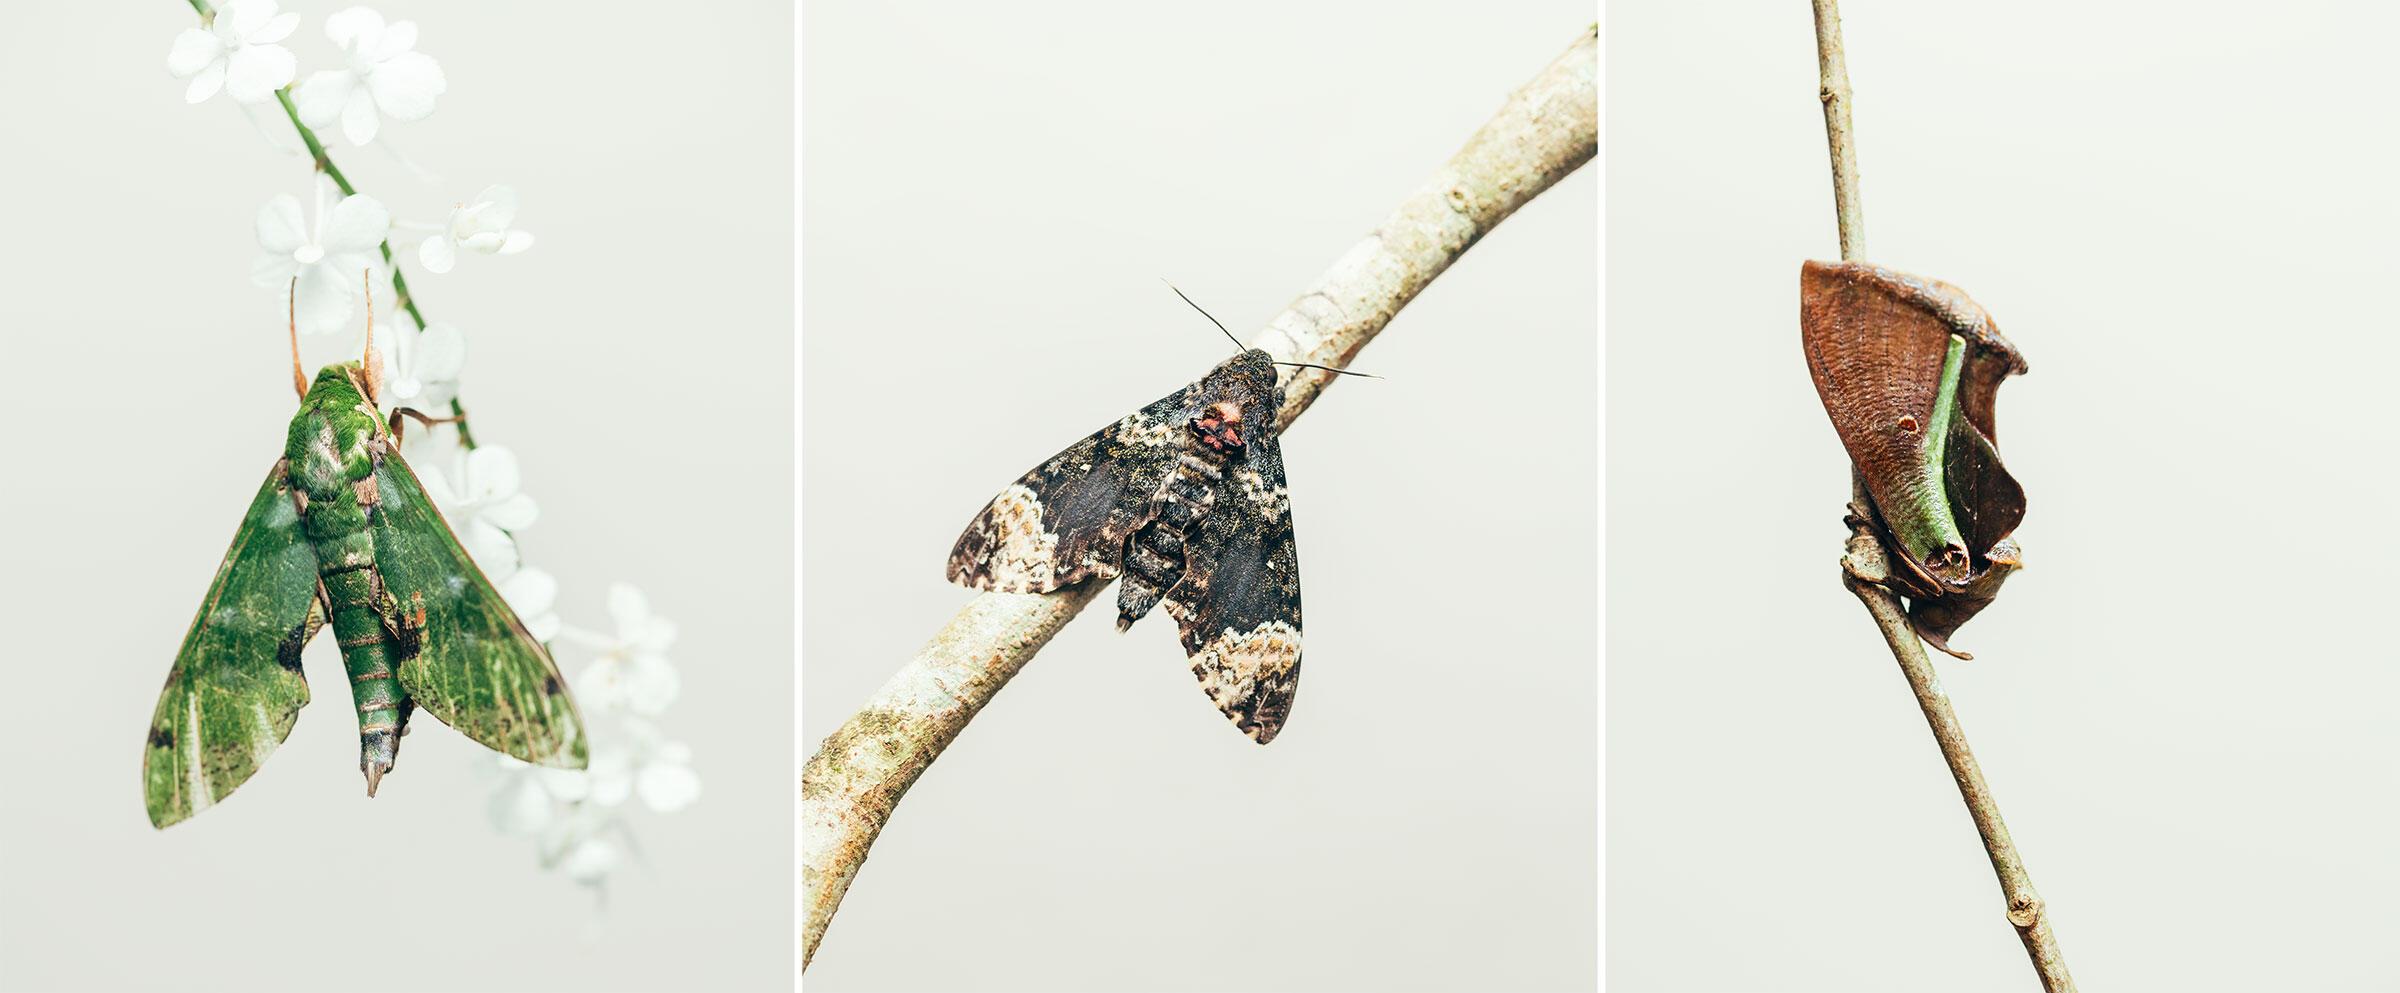 From left: Verdant hawkmoth; fulvous hawk; part of the genus of fruit piercer moths. Photos: Tristan Spinski